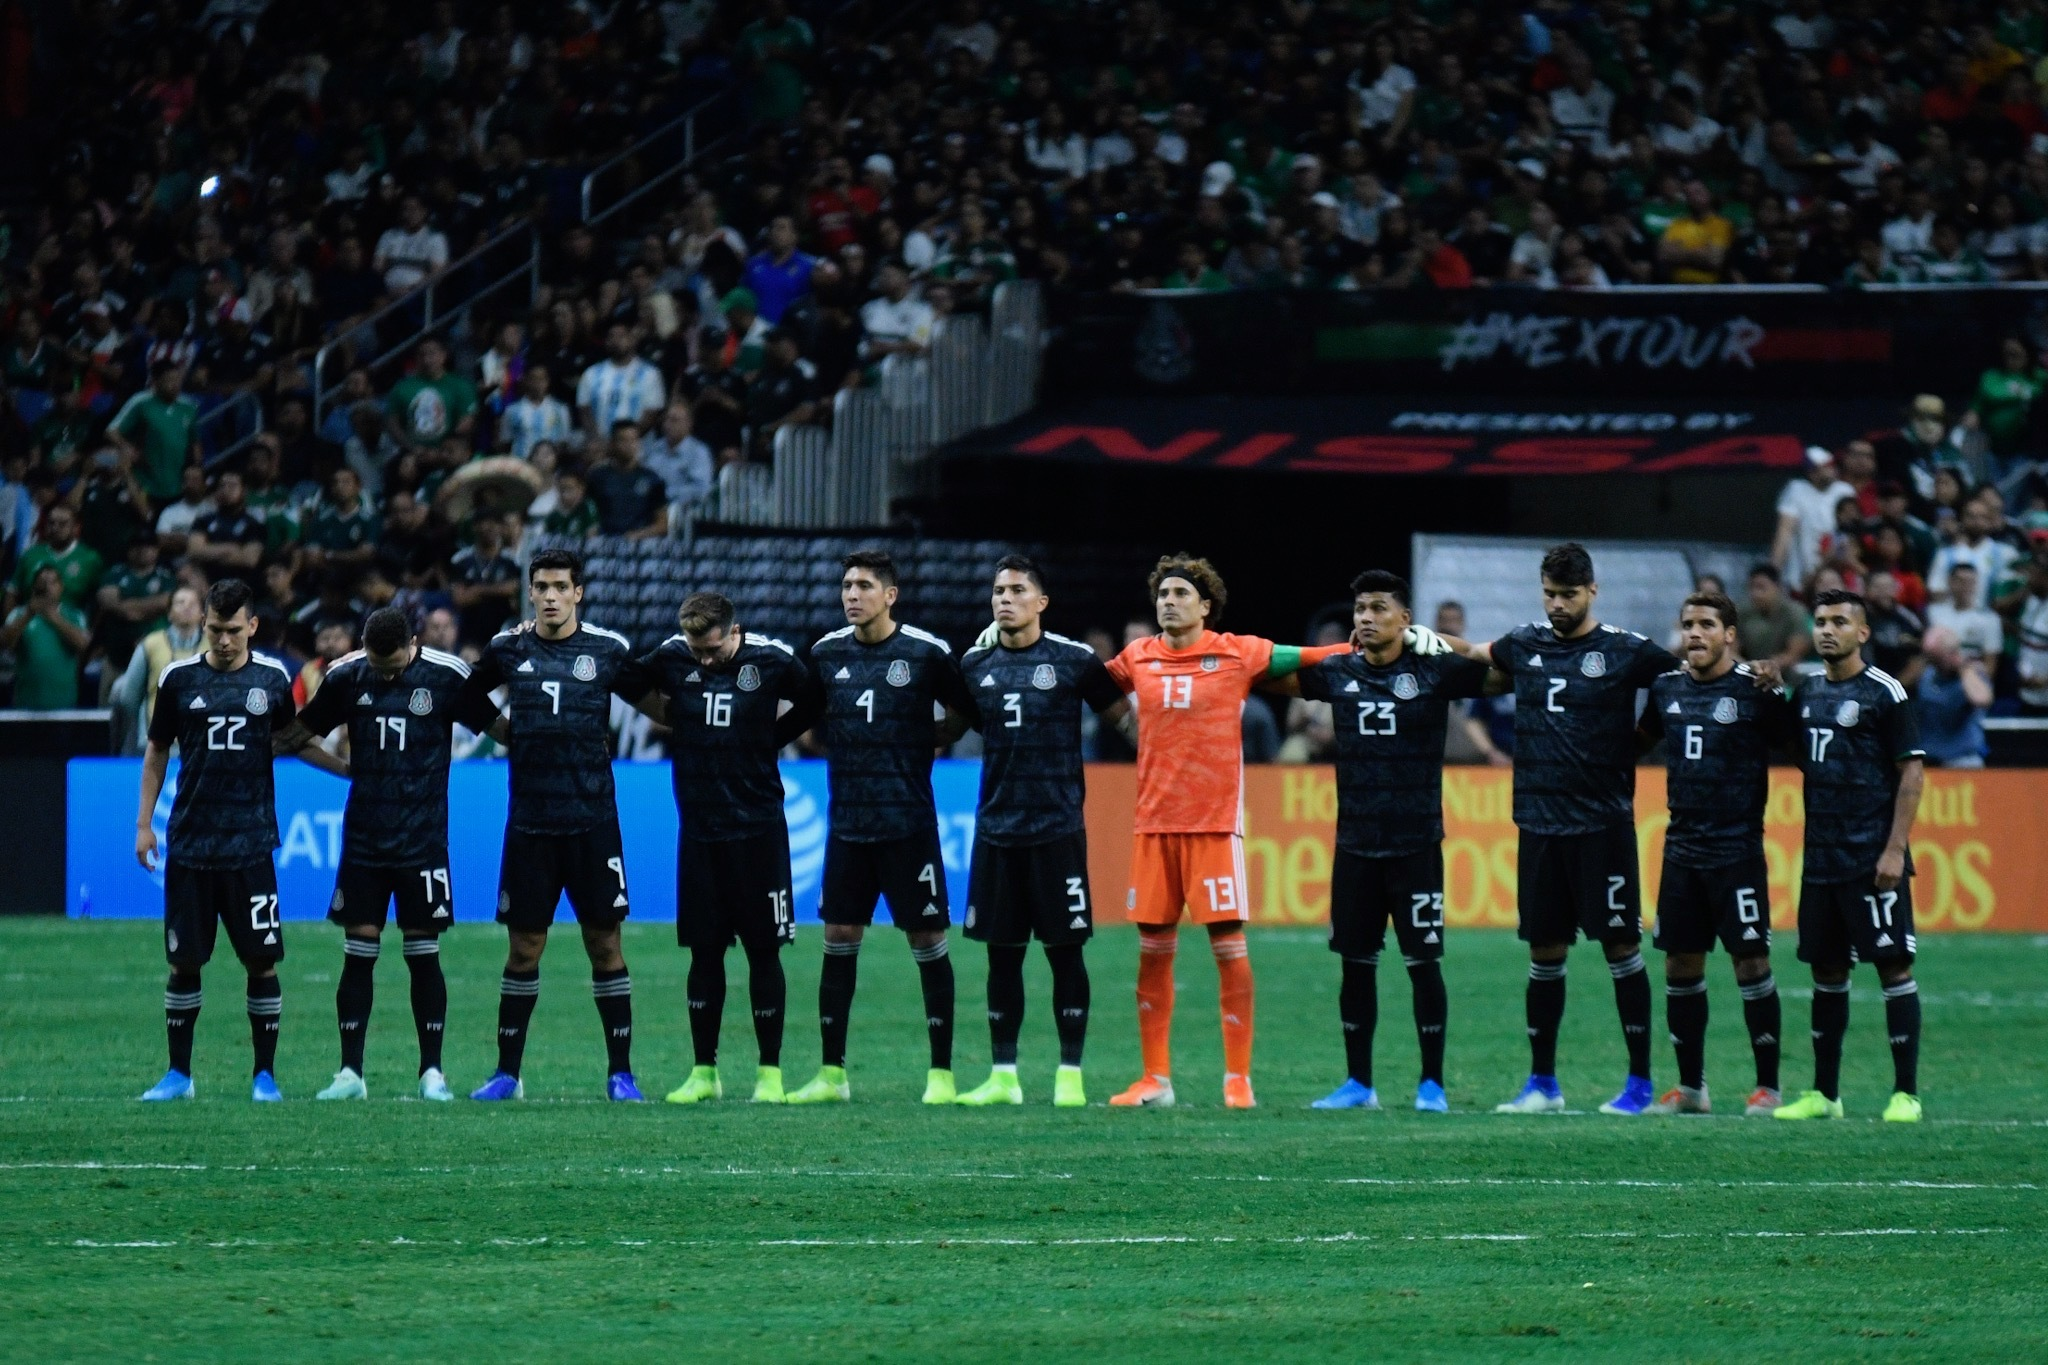 Resultado de imagen para Fotos goles argentina 4-0 a México, alamodome